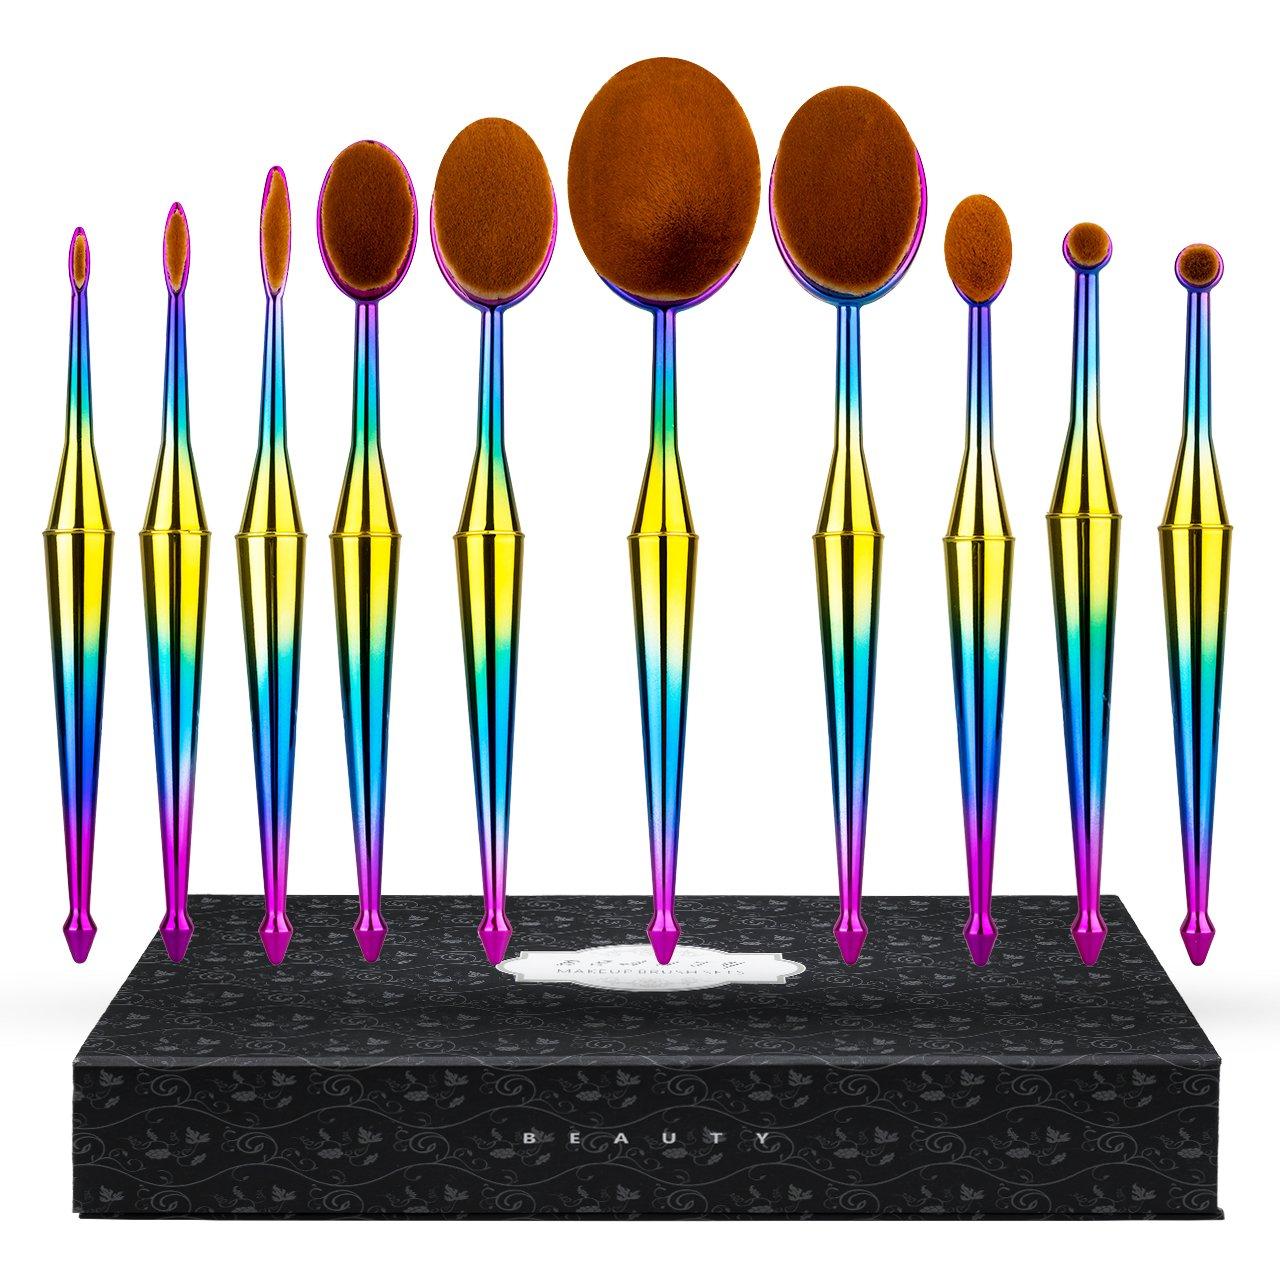 Makeup Brushes, ElleSye Cosmetic Brush 10-Piece Set, Toothbrush Shaped, Colorful Handle, Soft Synthetic Fiber Oral Makeup Brush for Foundation, Powder, BB Cream, Eyeliner, Concealer, Countour, Blush